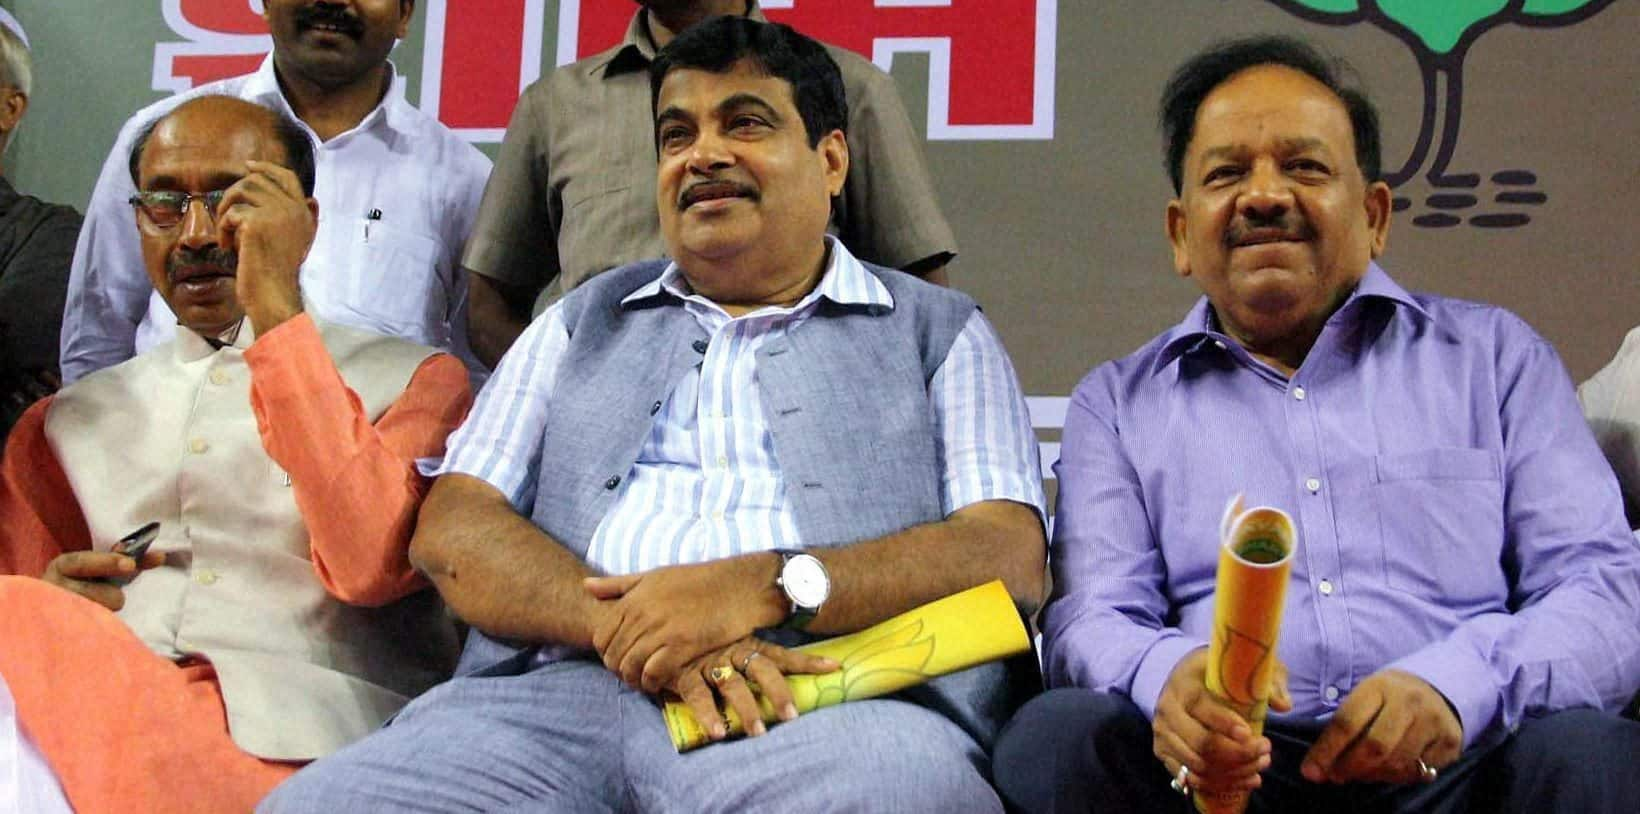 BJP former president Nitin Gadkari with Vijay Goel and Harsh Vardhan during a function in east Delhi.